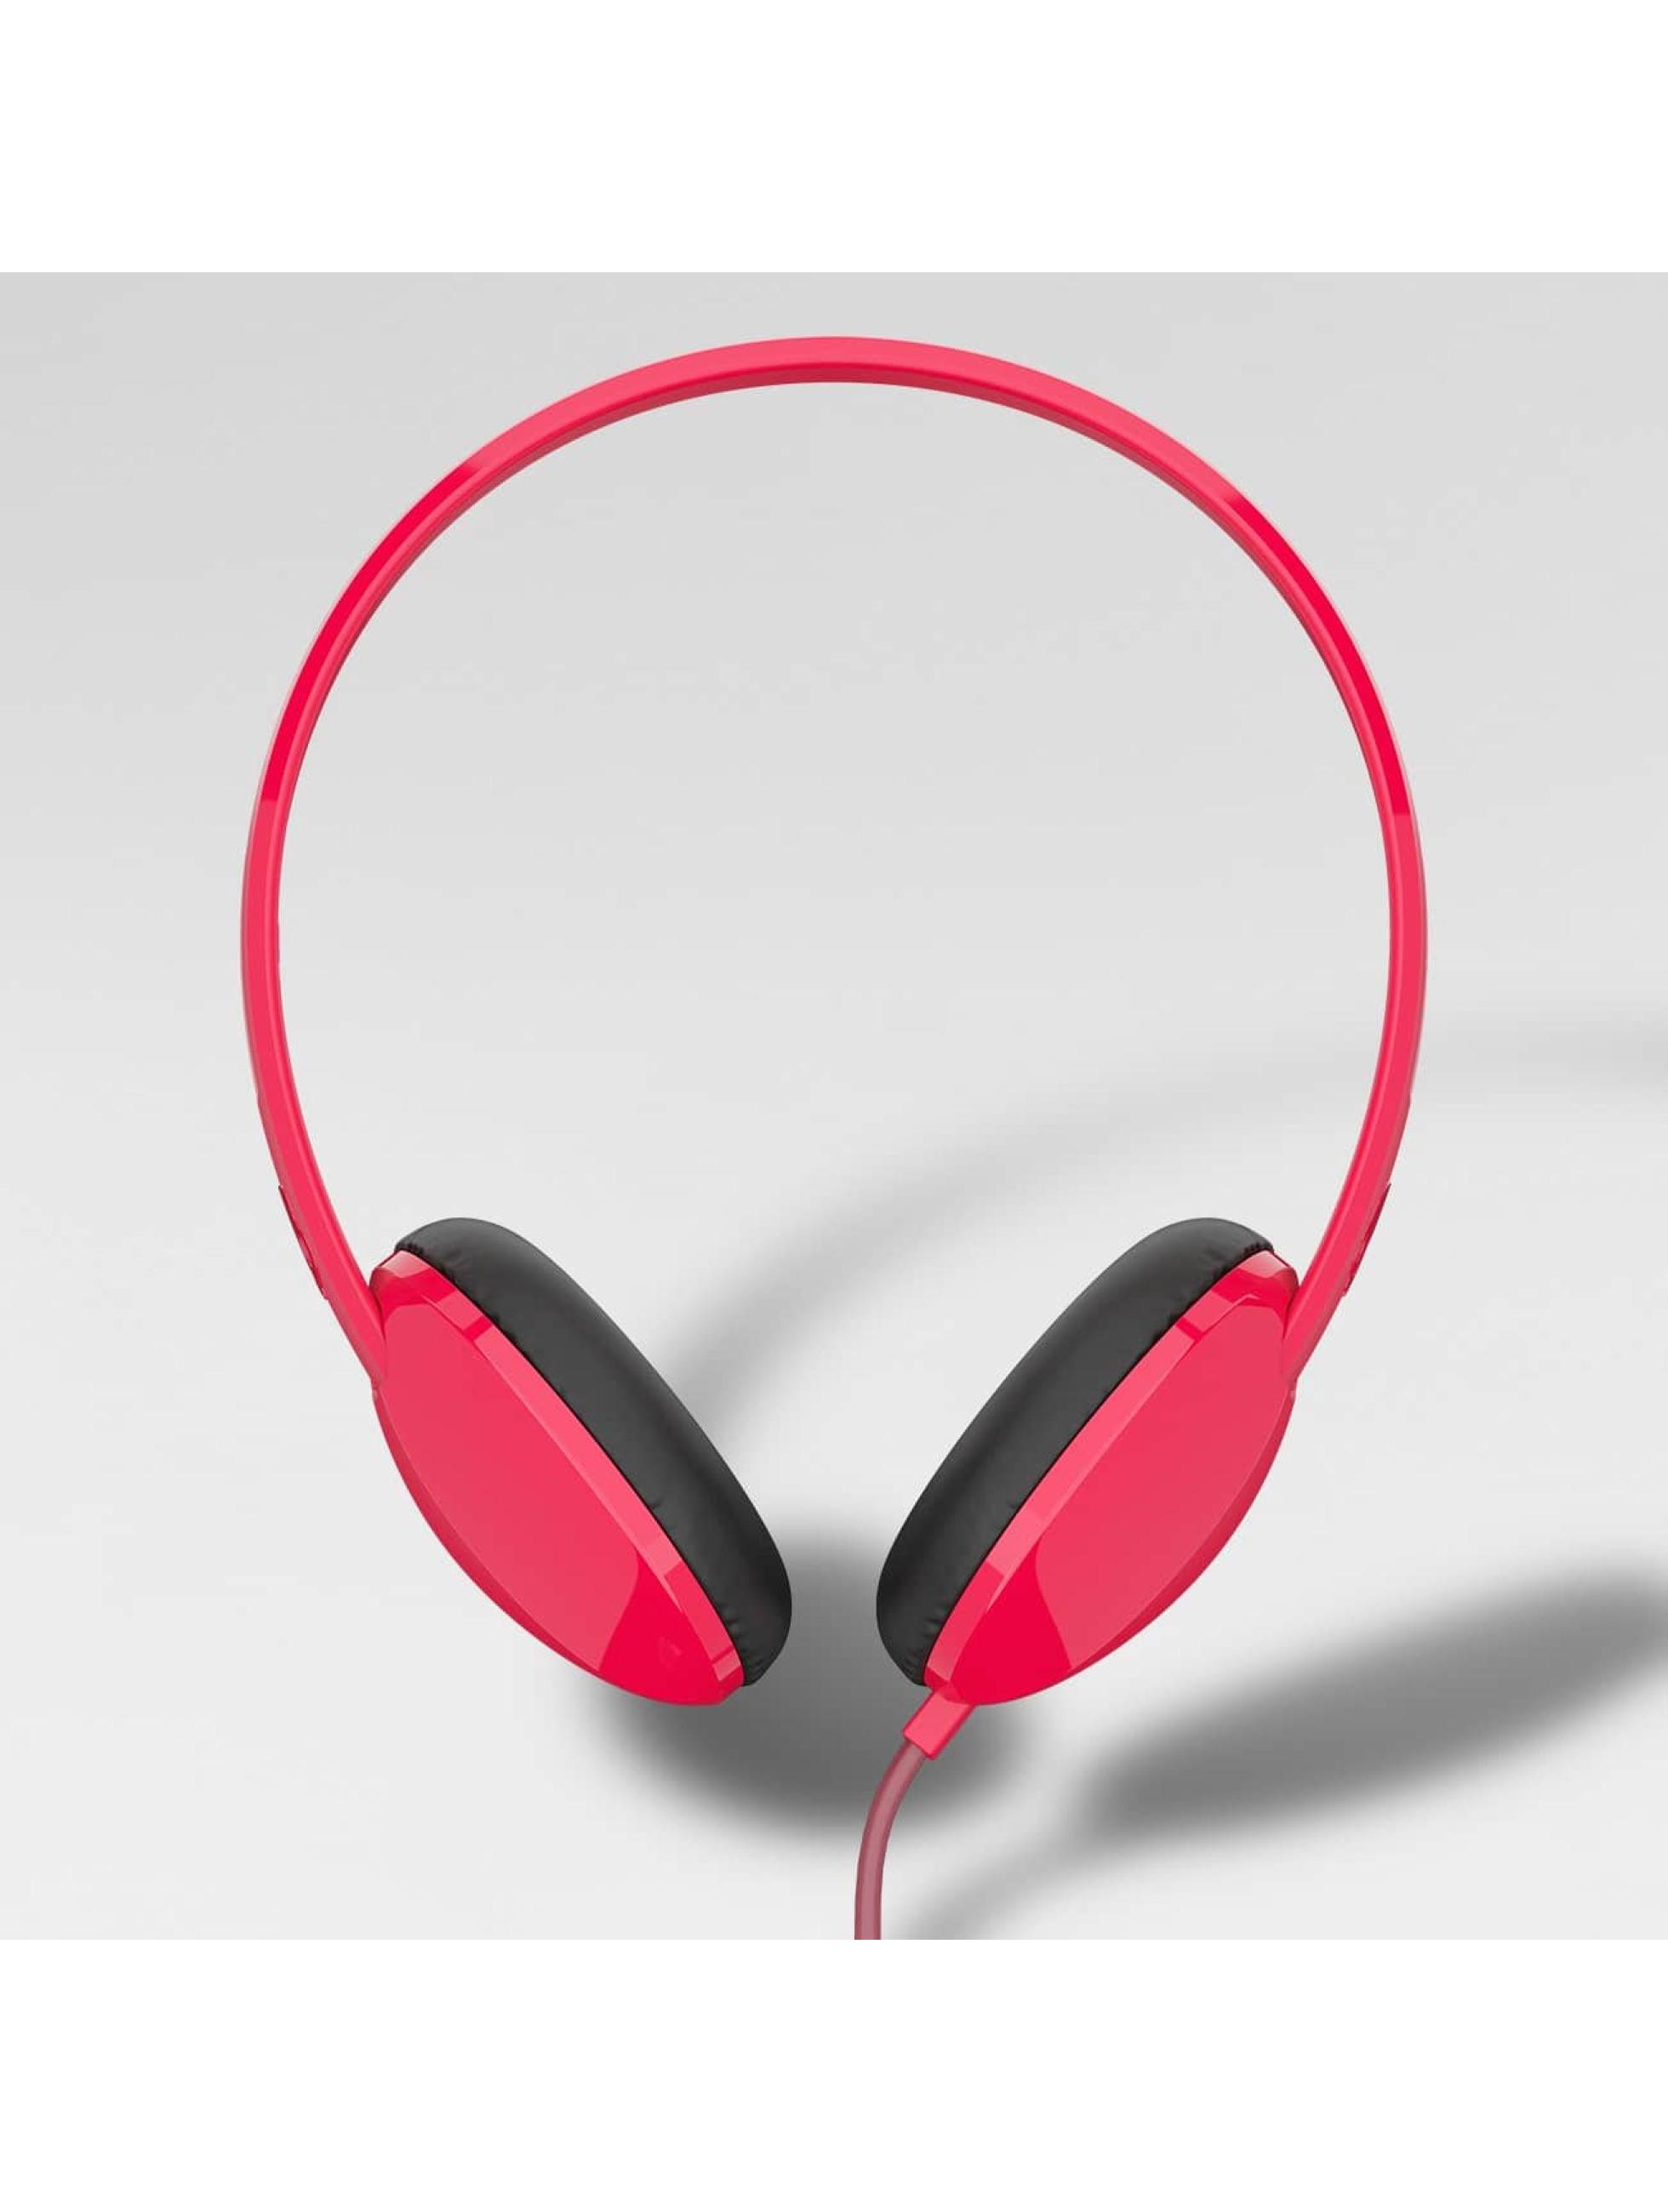 Skullcandy Cuffie musica Stim Mic 1 On Ear rosso